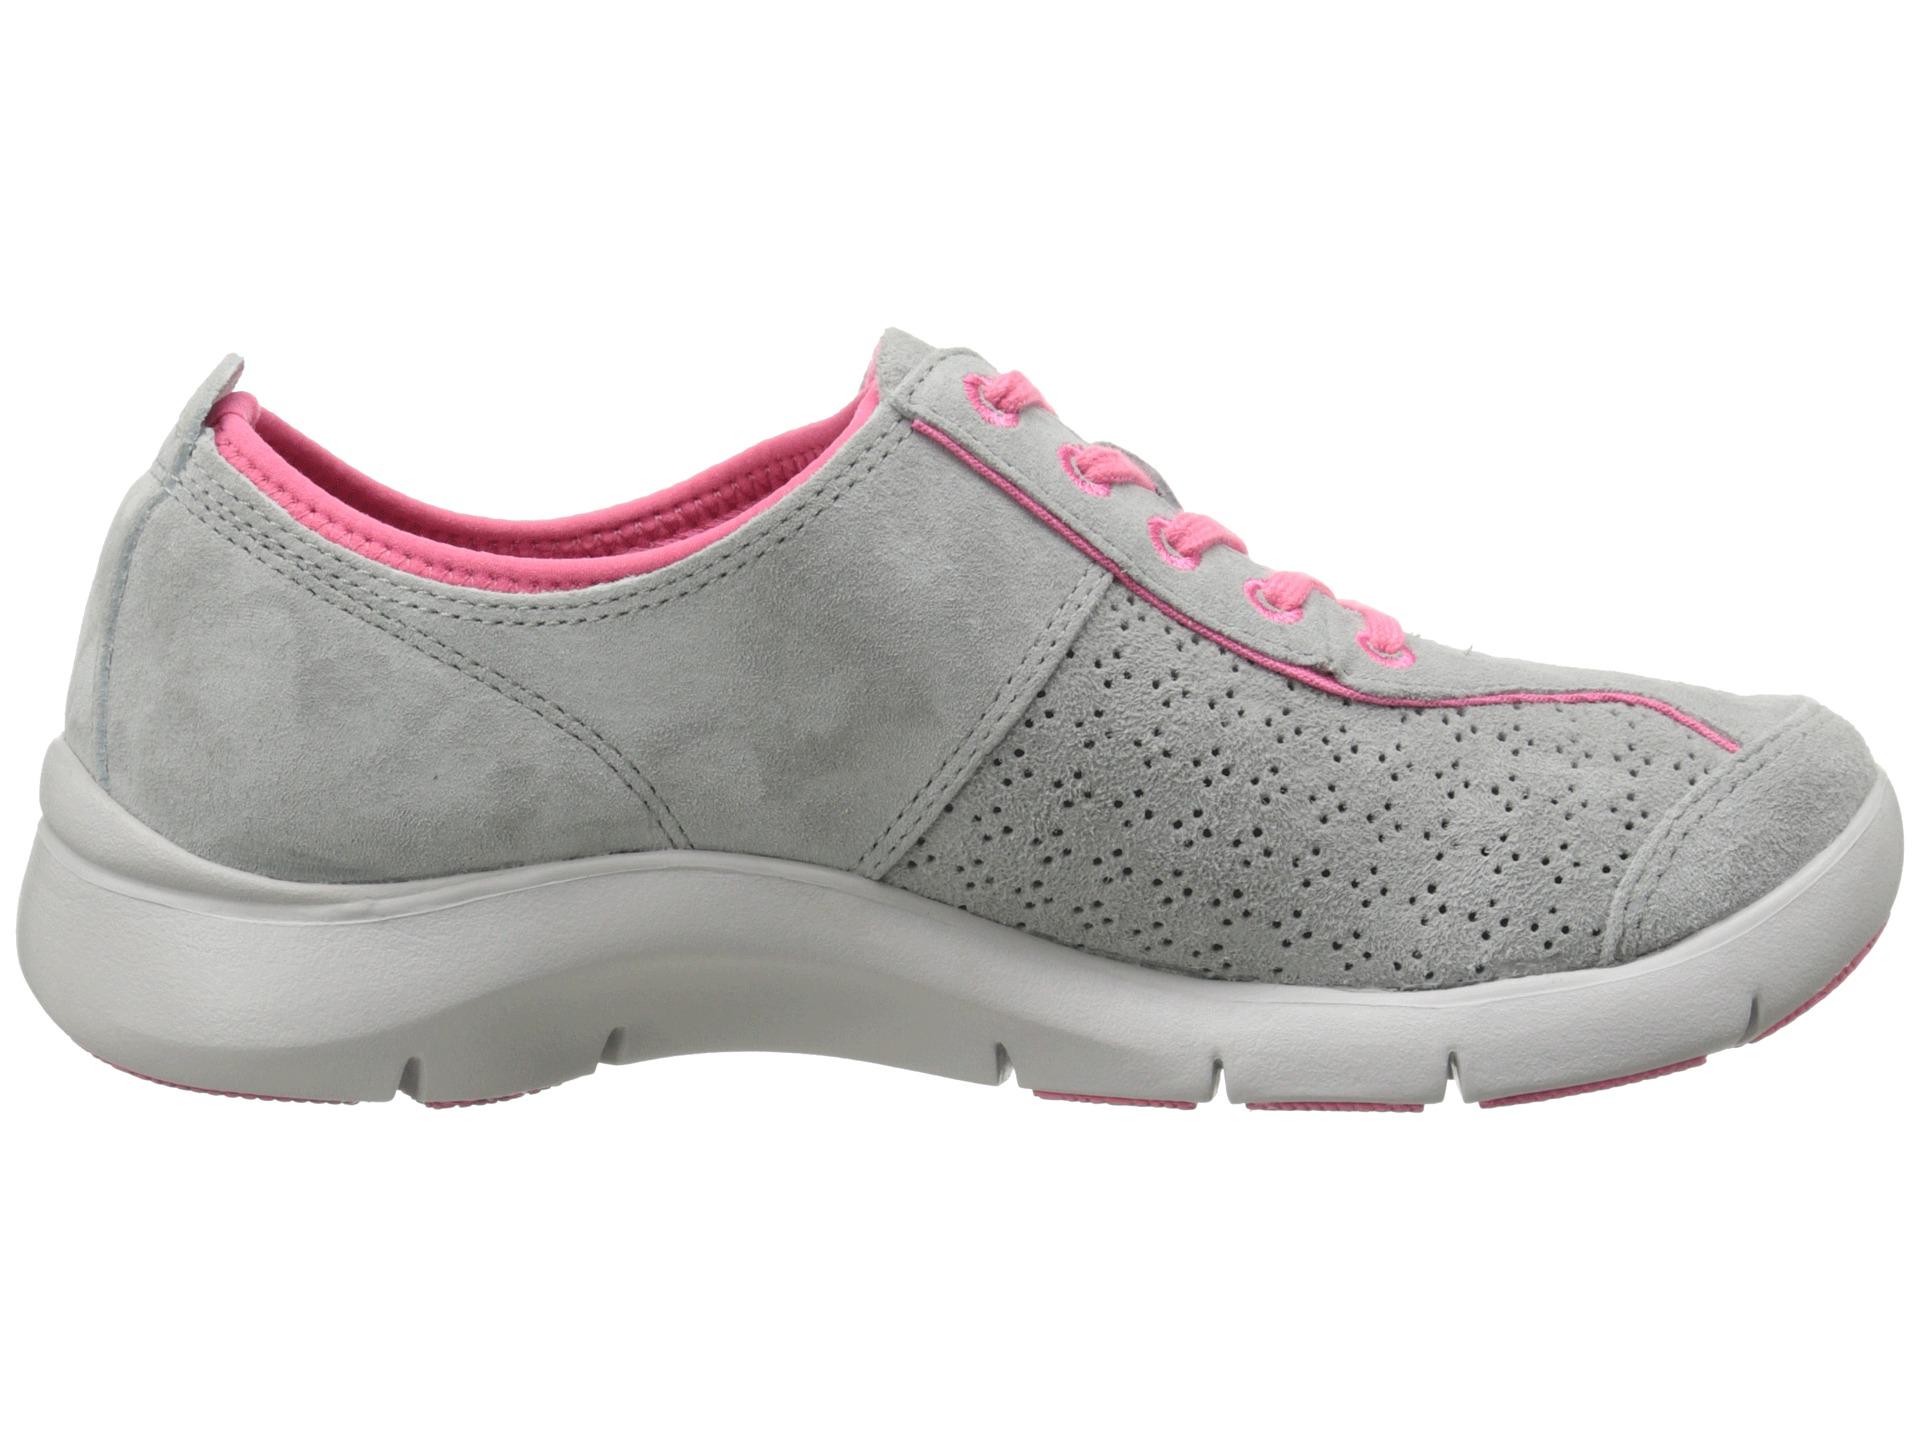 Dansko Elise Shoes Reviews